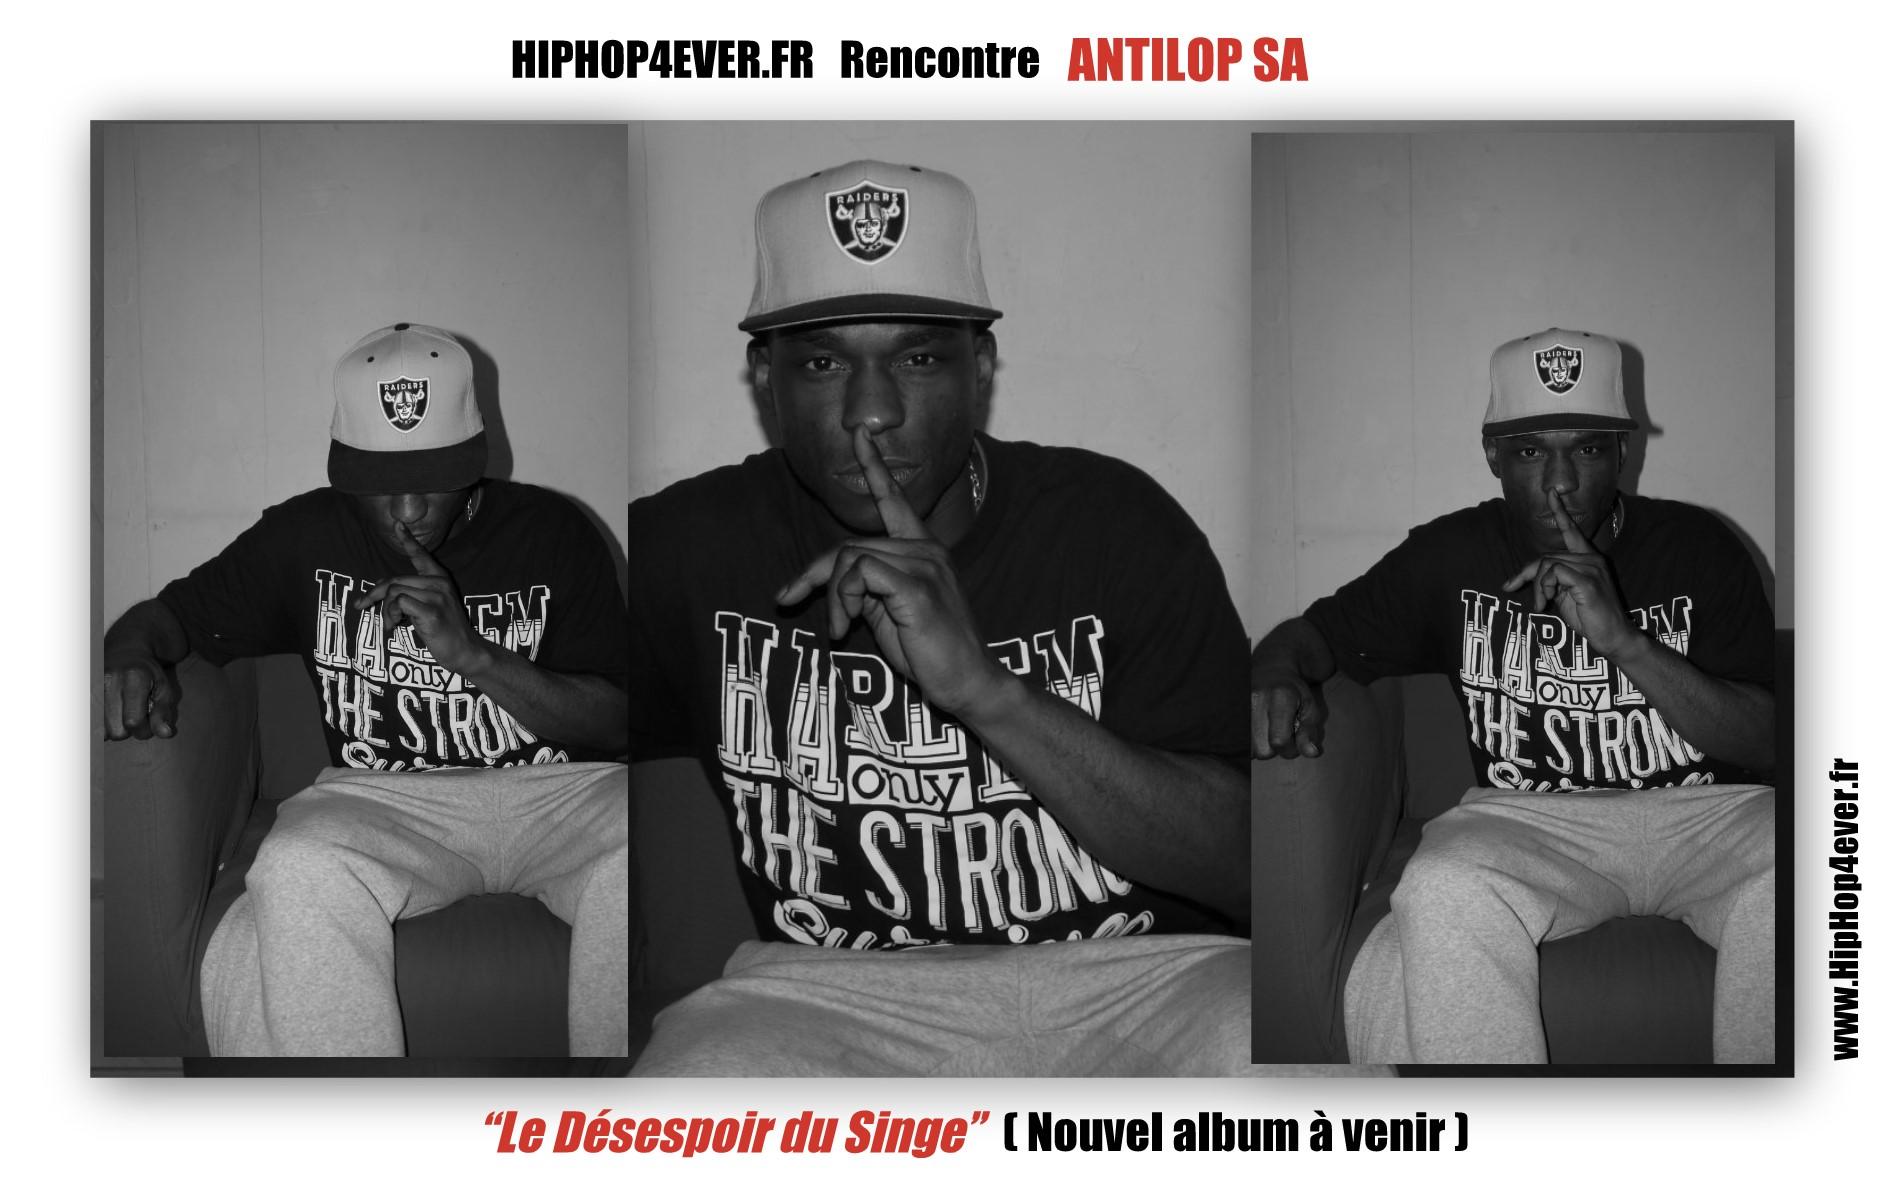 ANTILOP SA - INTW SINGE 1